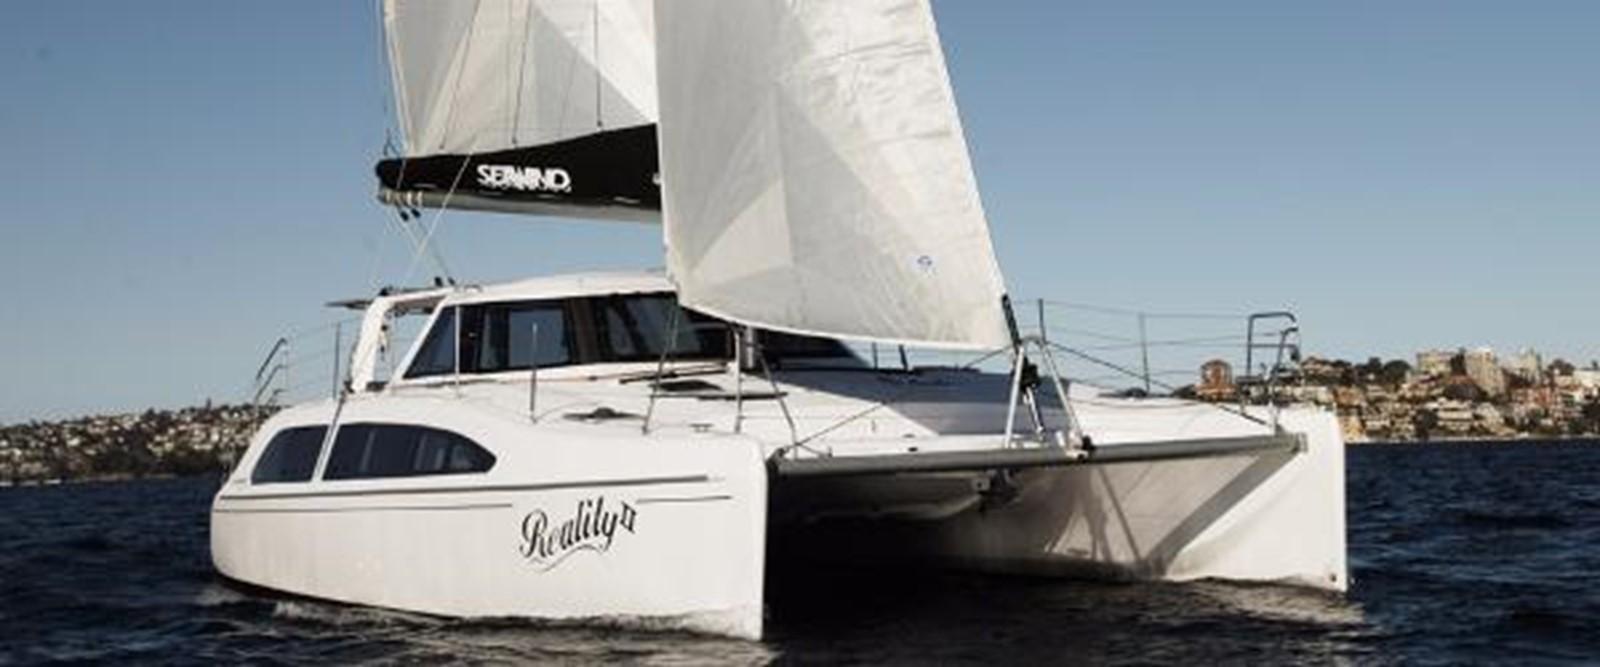 Manufacturer Provided Image: Seawind 1160 Lite 2019 SEAWIND CATAMARANS 1160 Lite Catamaran 1521845